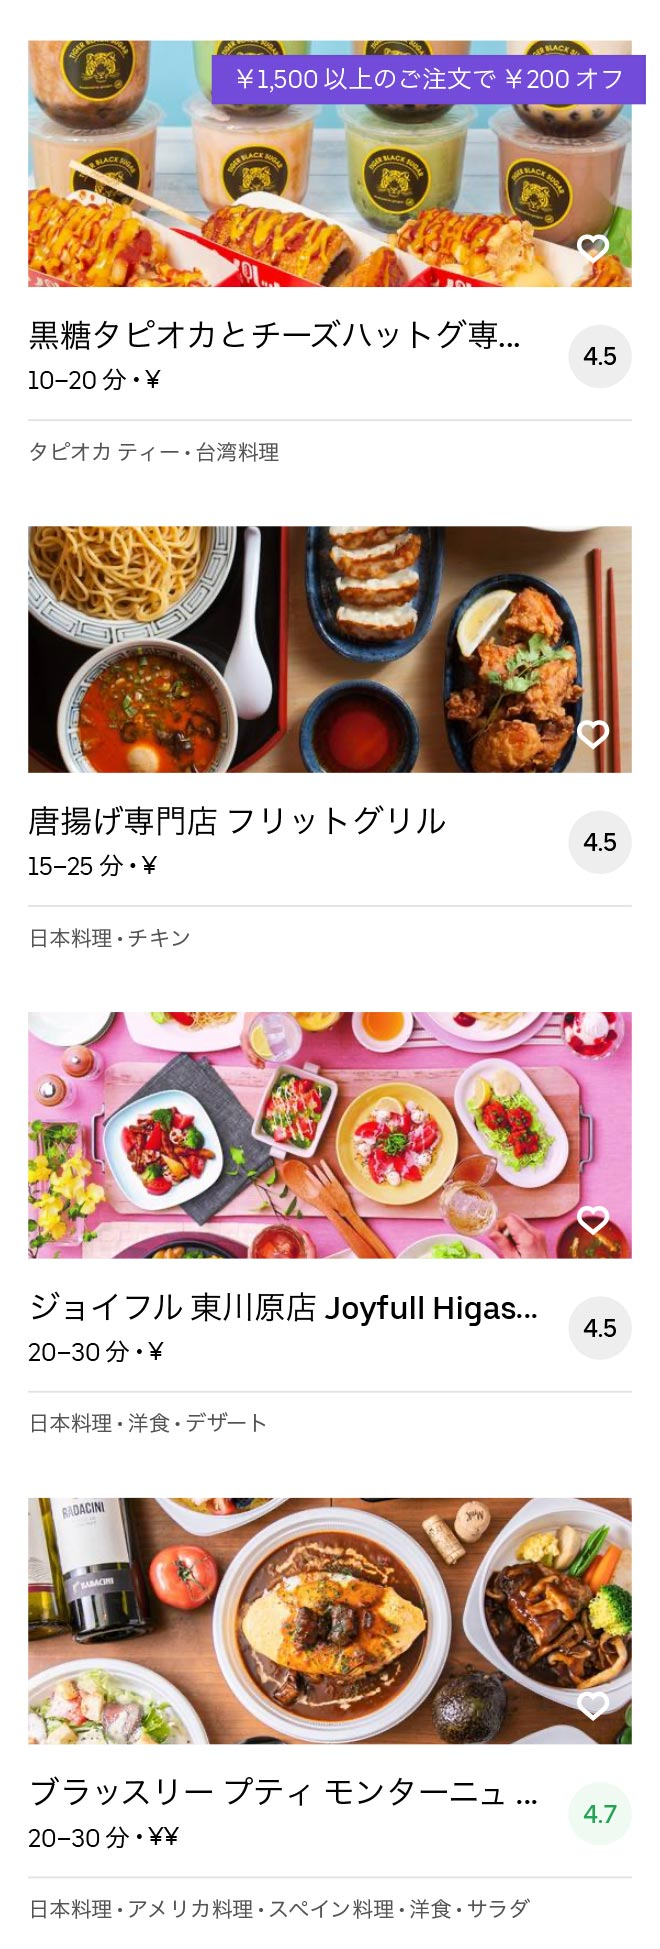 Okayama menu 2007 07